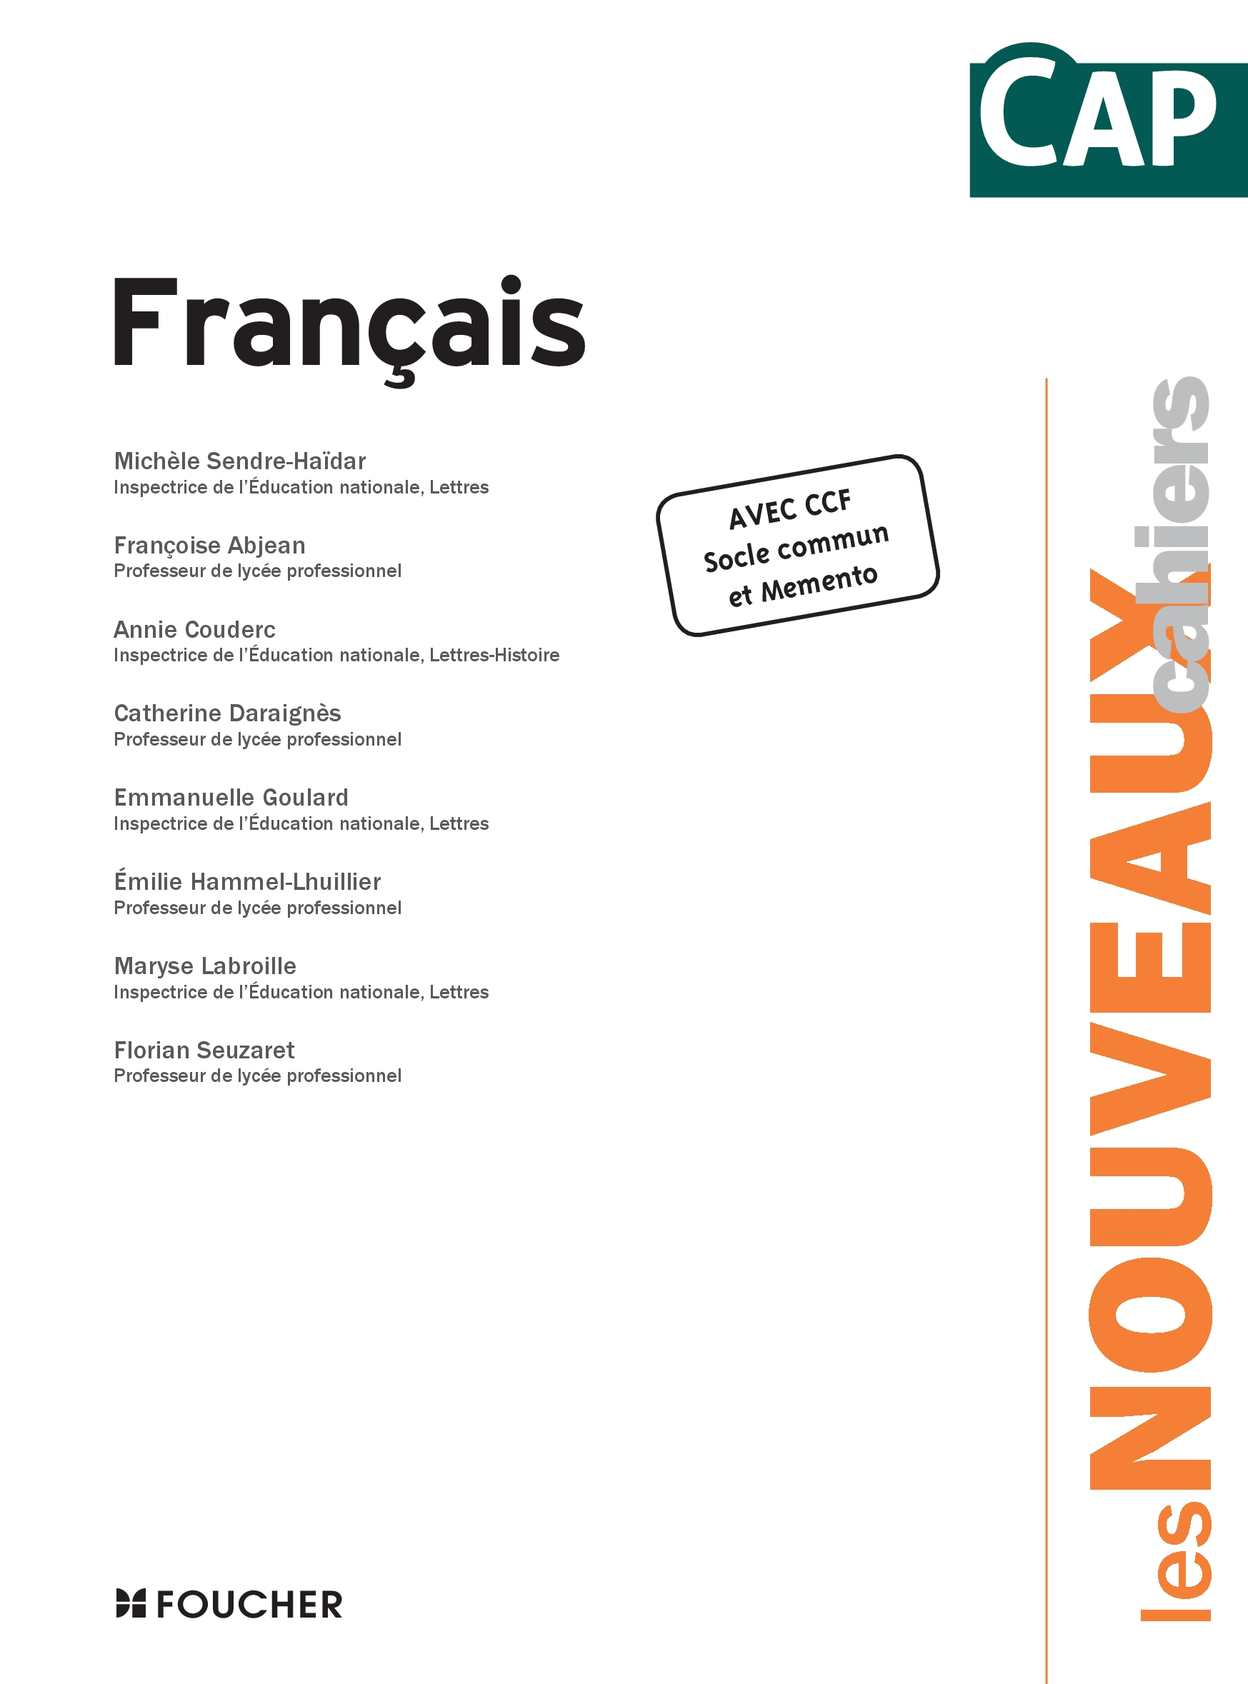 PDF  01 04 FrancaisCAP CP